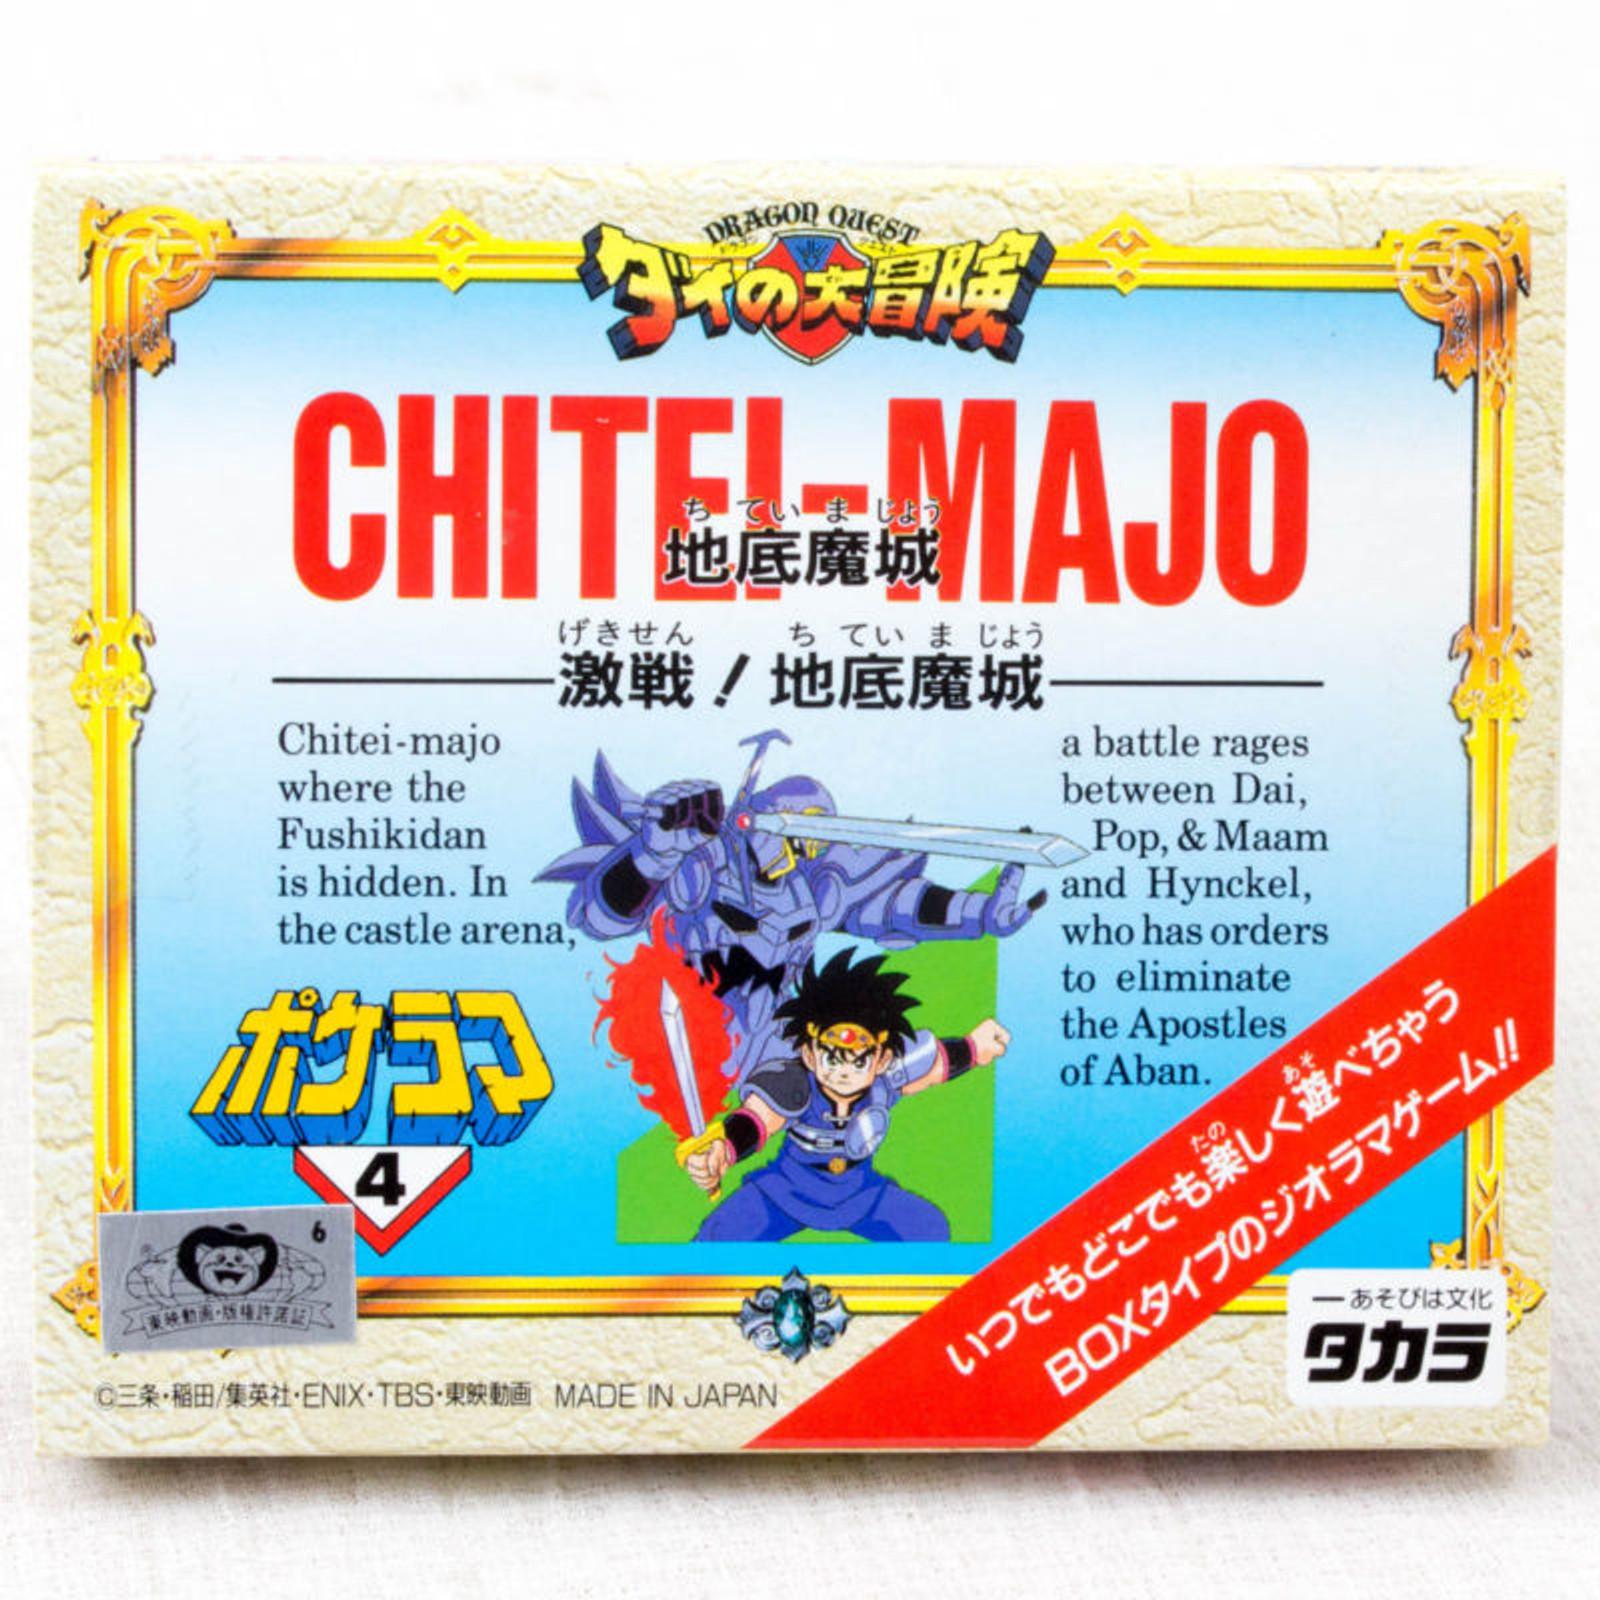 Dragon Quest: The Adventure of Dai Pokerama #4 Chitei-Majo Mini Diorama Figure TAKARA